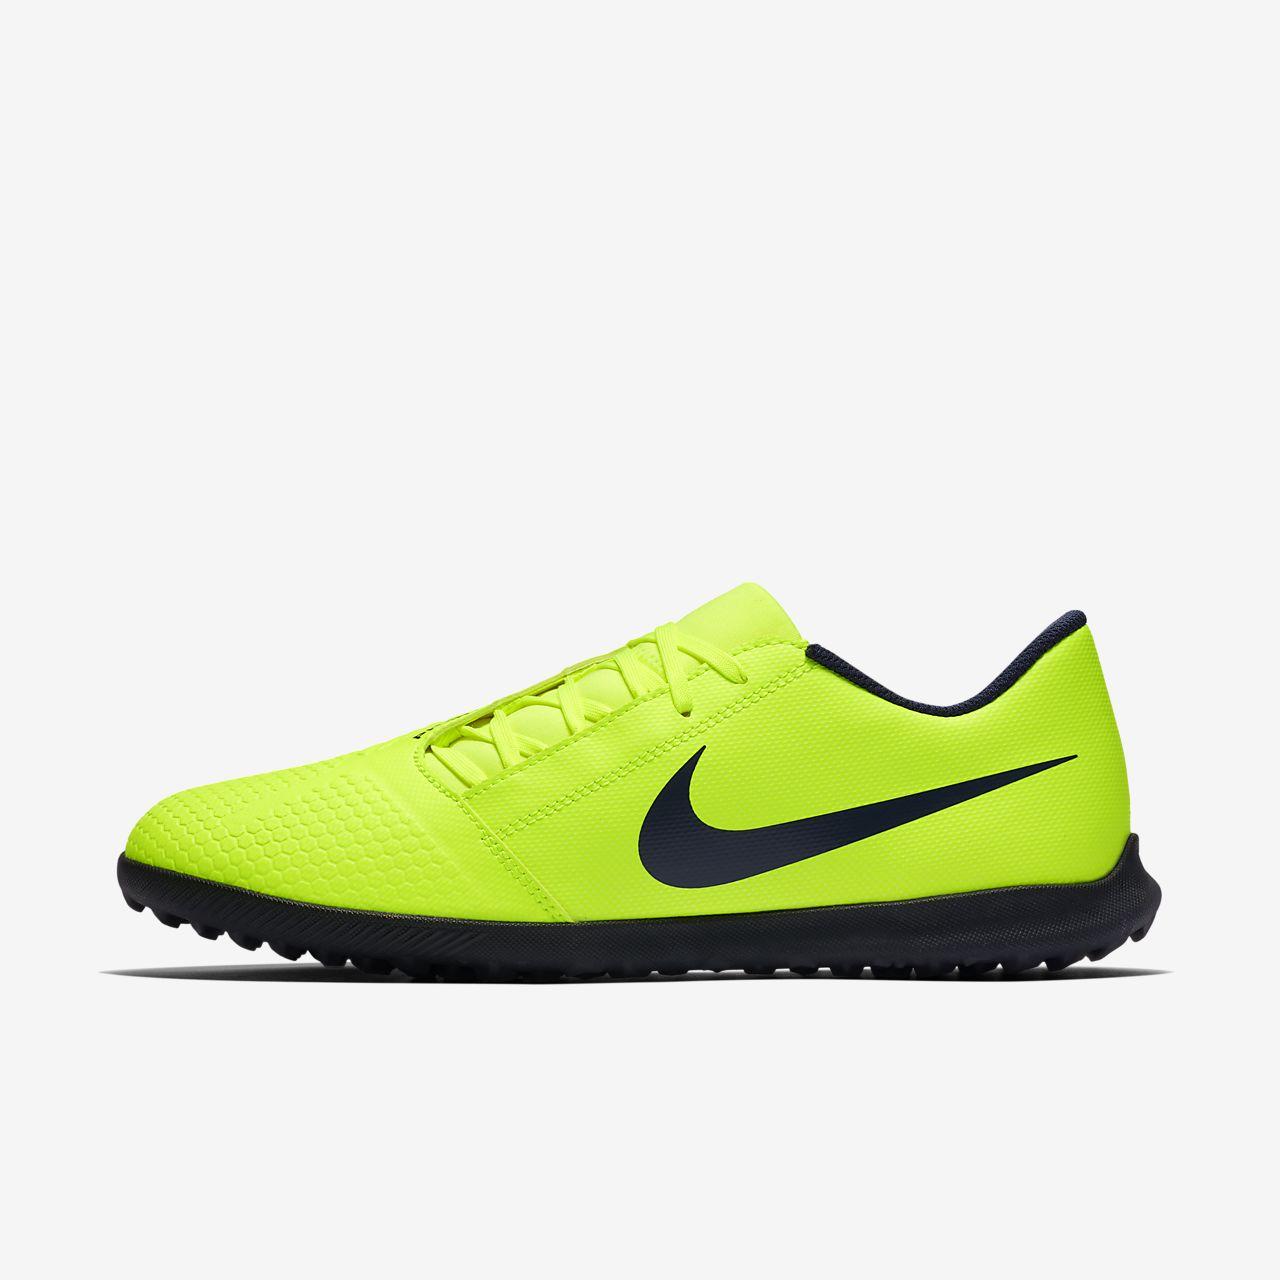 Fotbollssko för grus/turf Nike PhantomVNM Club TF